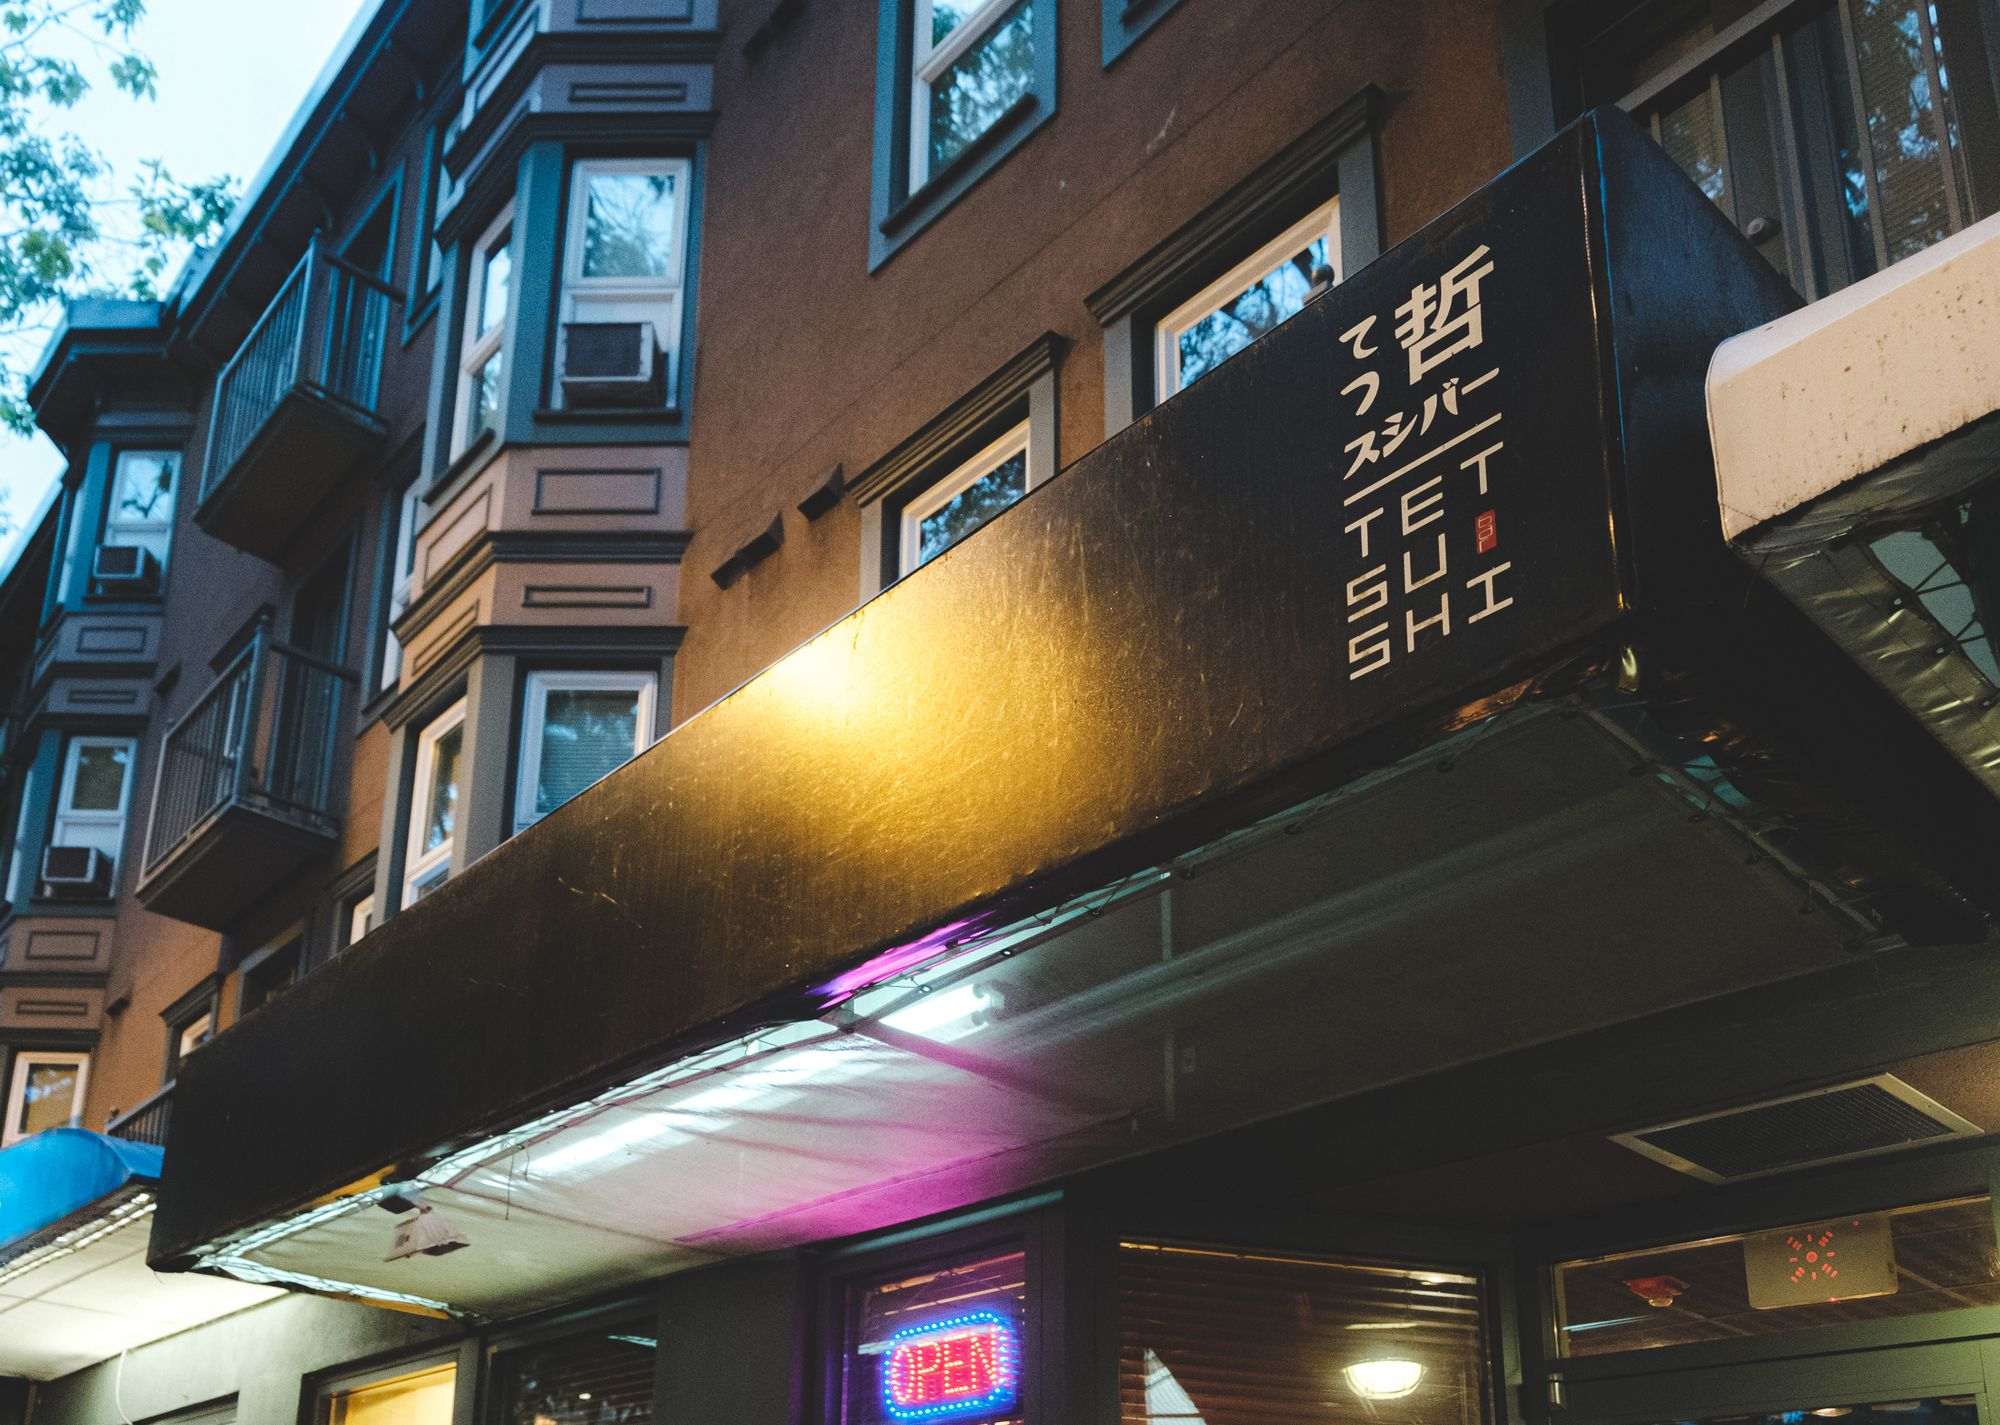 Outside Tetsu Sushi Bar